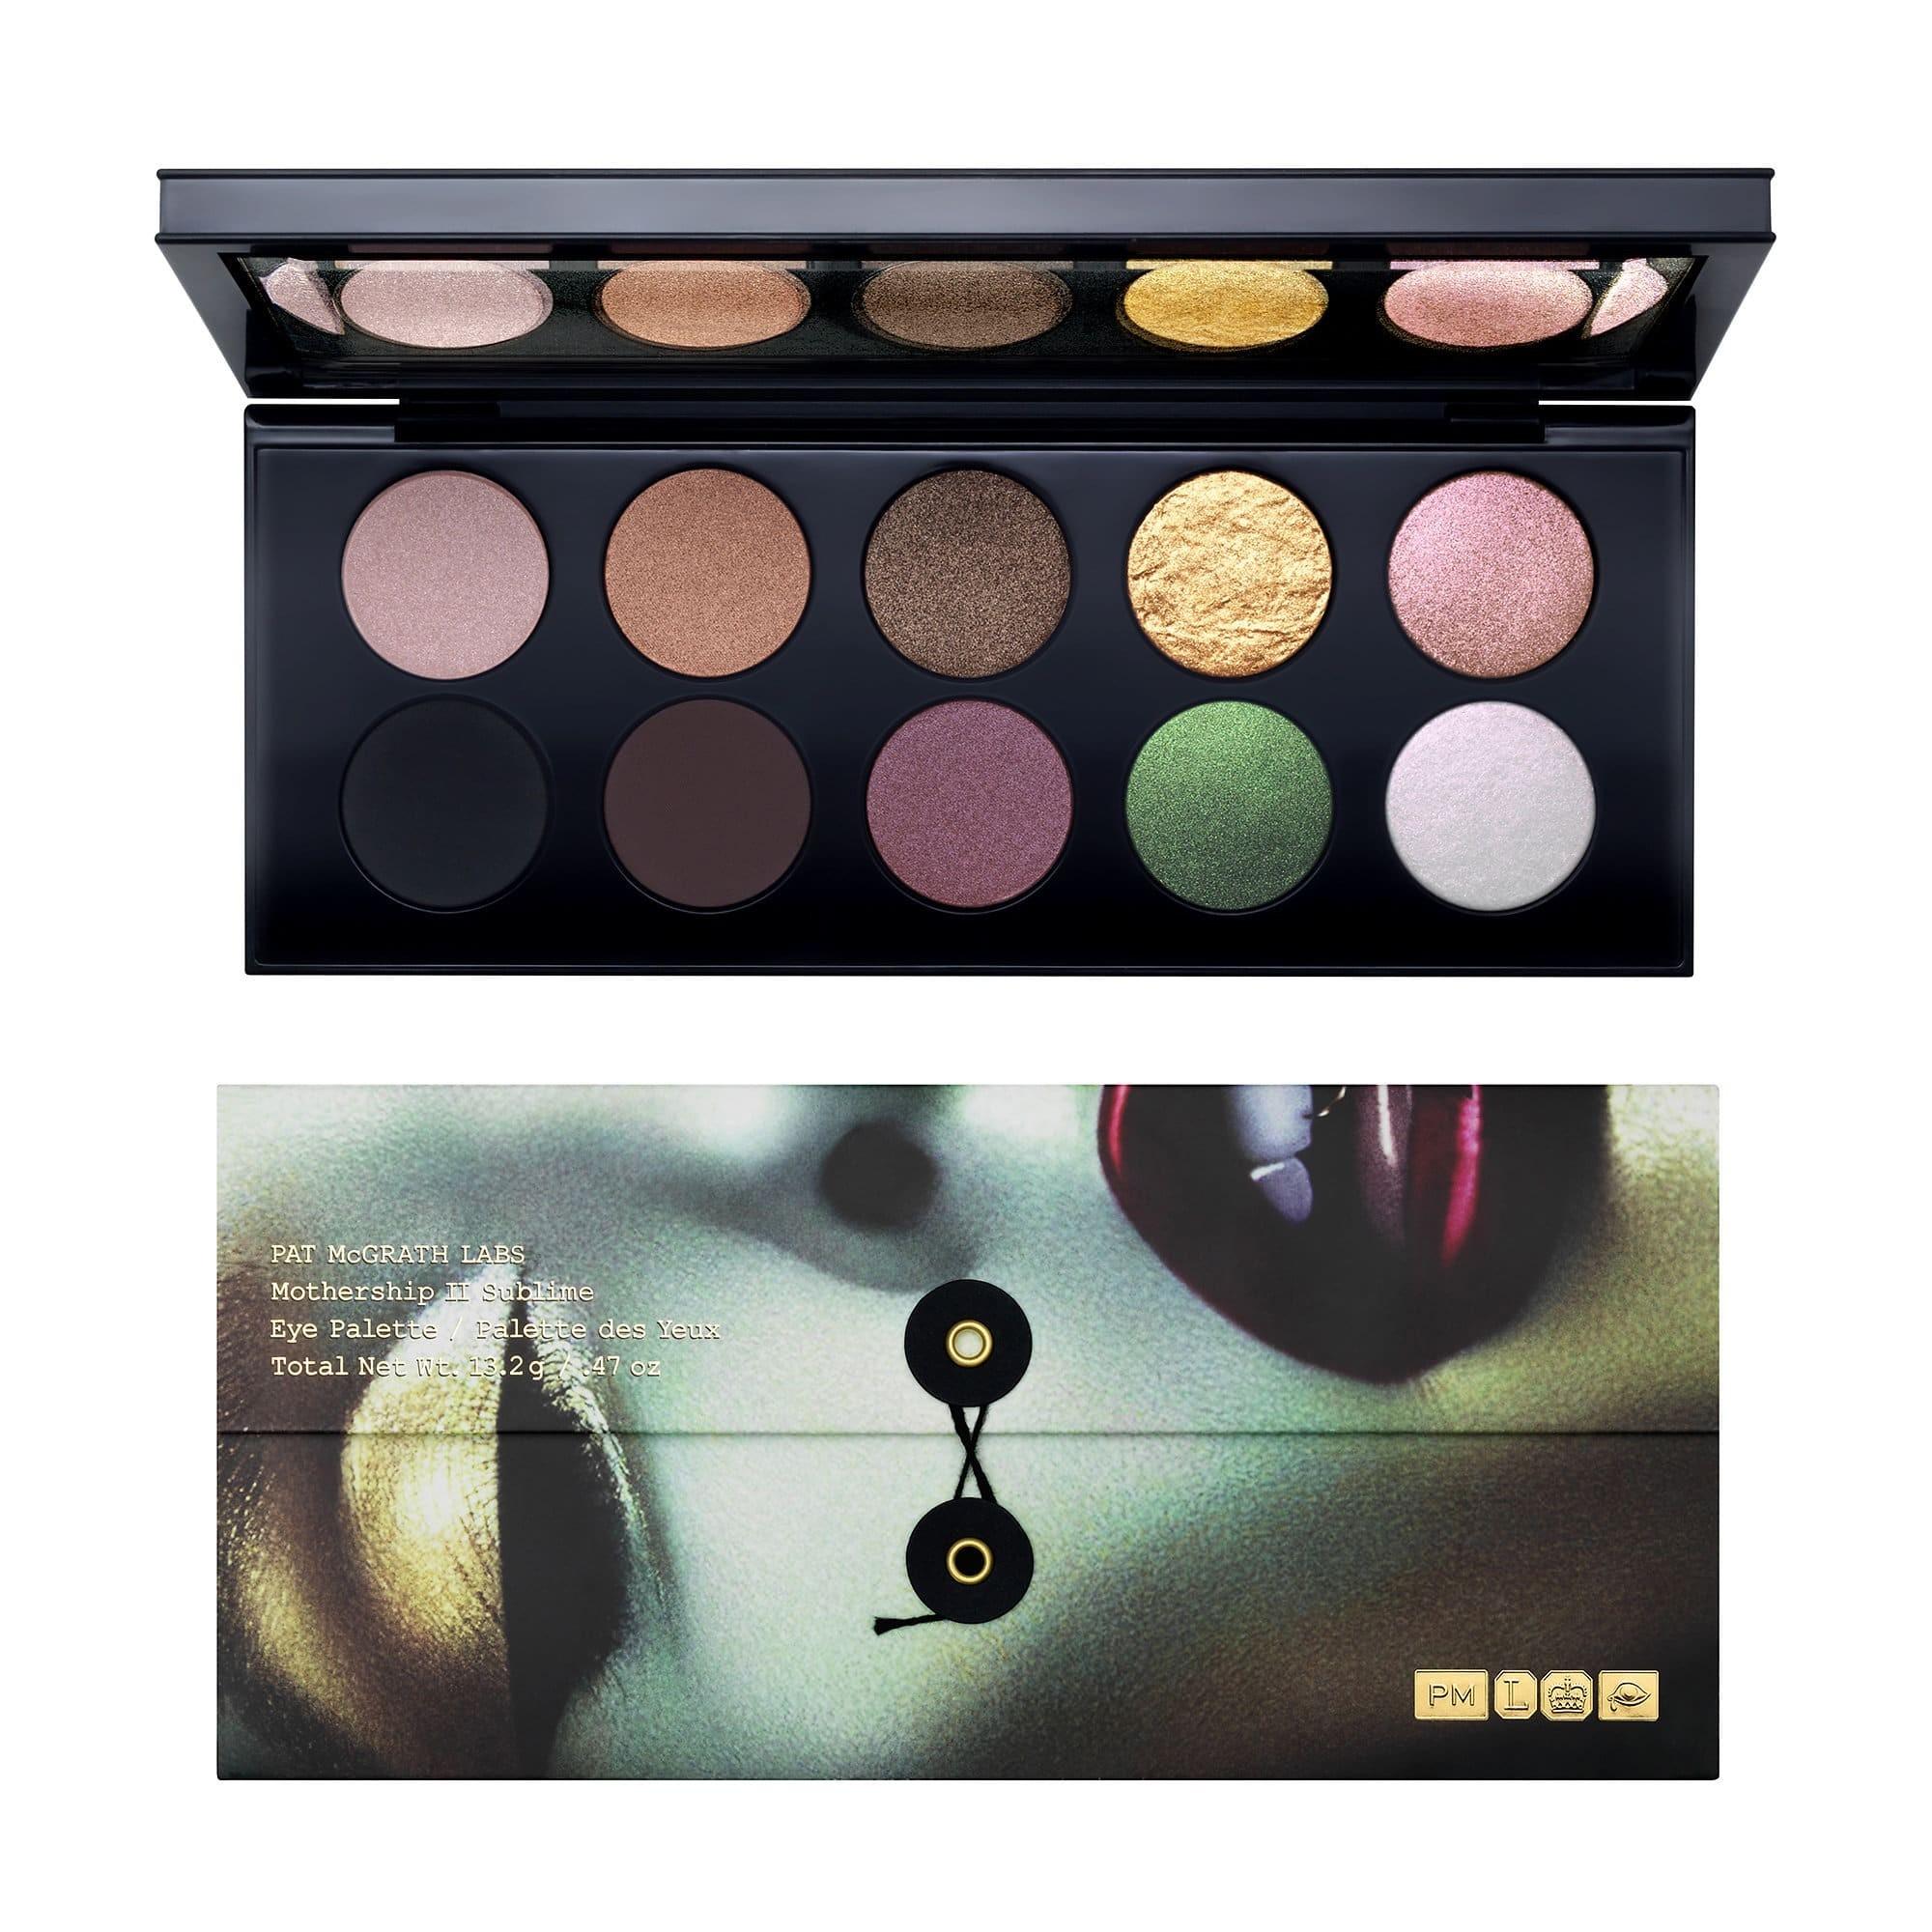 Pat McGrath Labs Mothership III Sublime Eyeshadow Palette